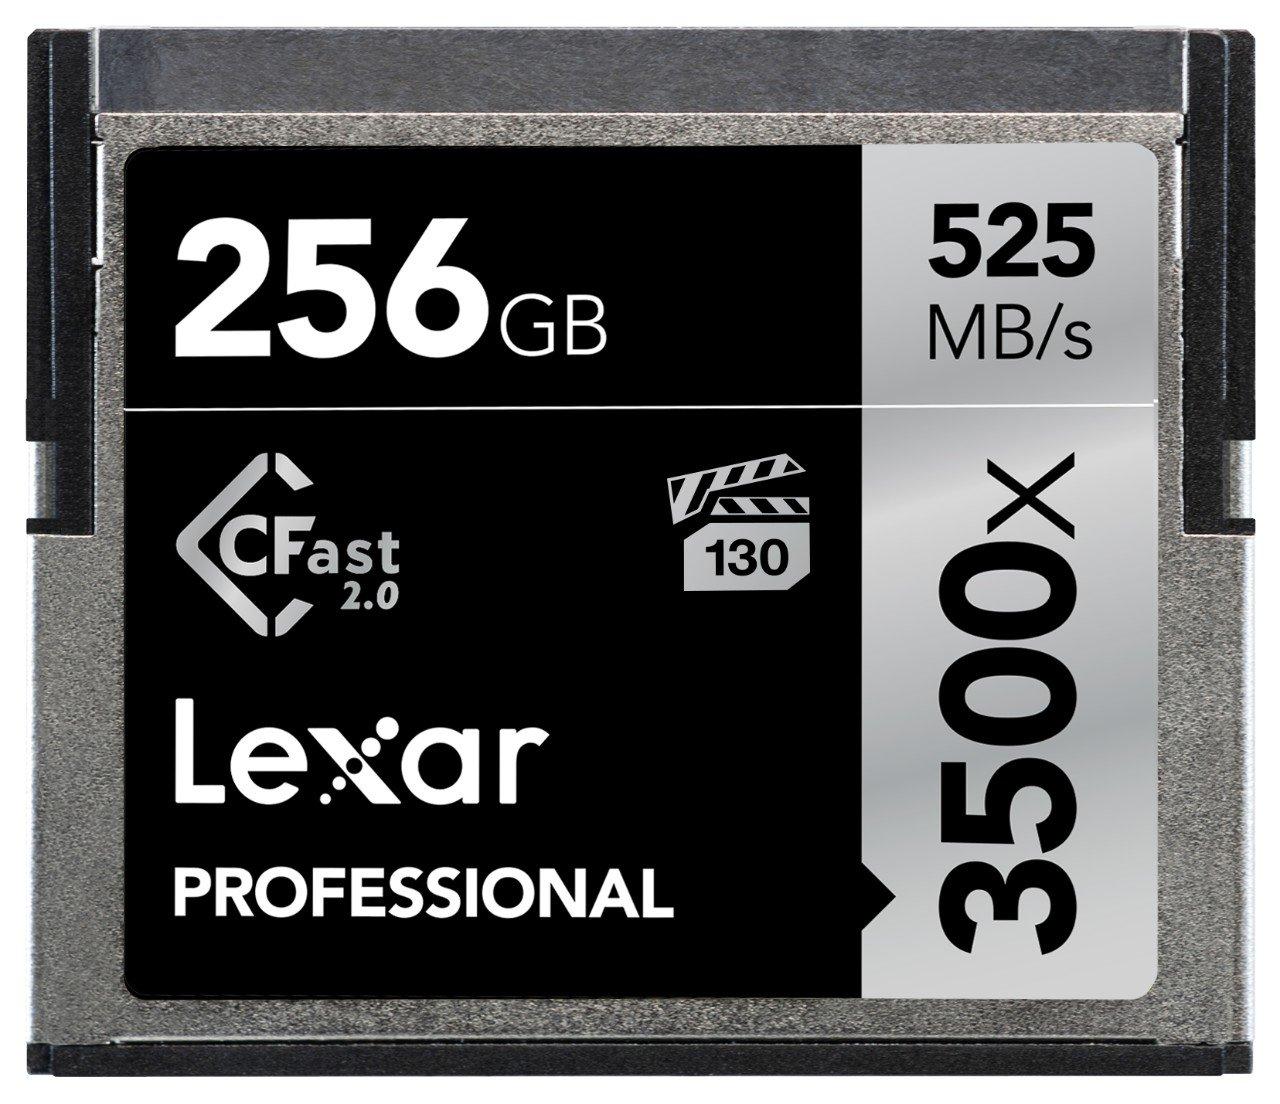 Lexar 32GB 3500x Pro CFast Compact Flash Card - LC32GCRBEU3500 LEXAR MEDIA INC 2.0 Professional